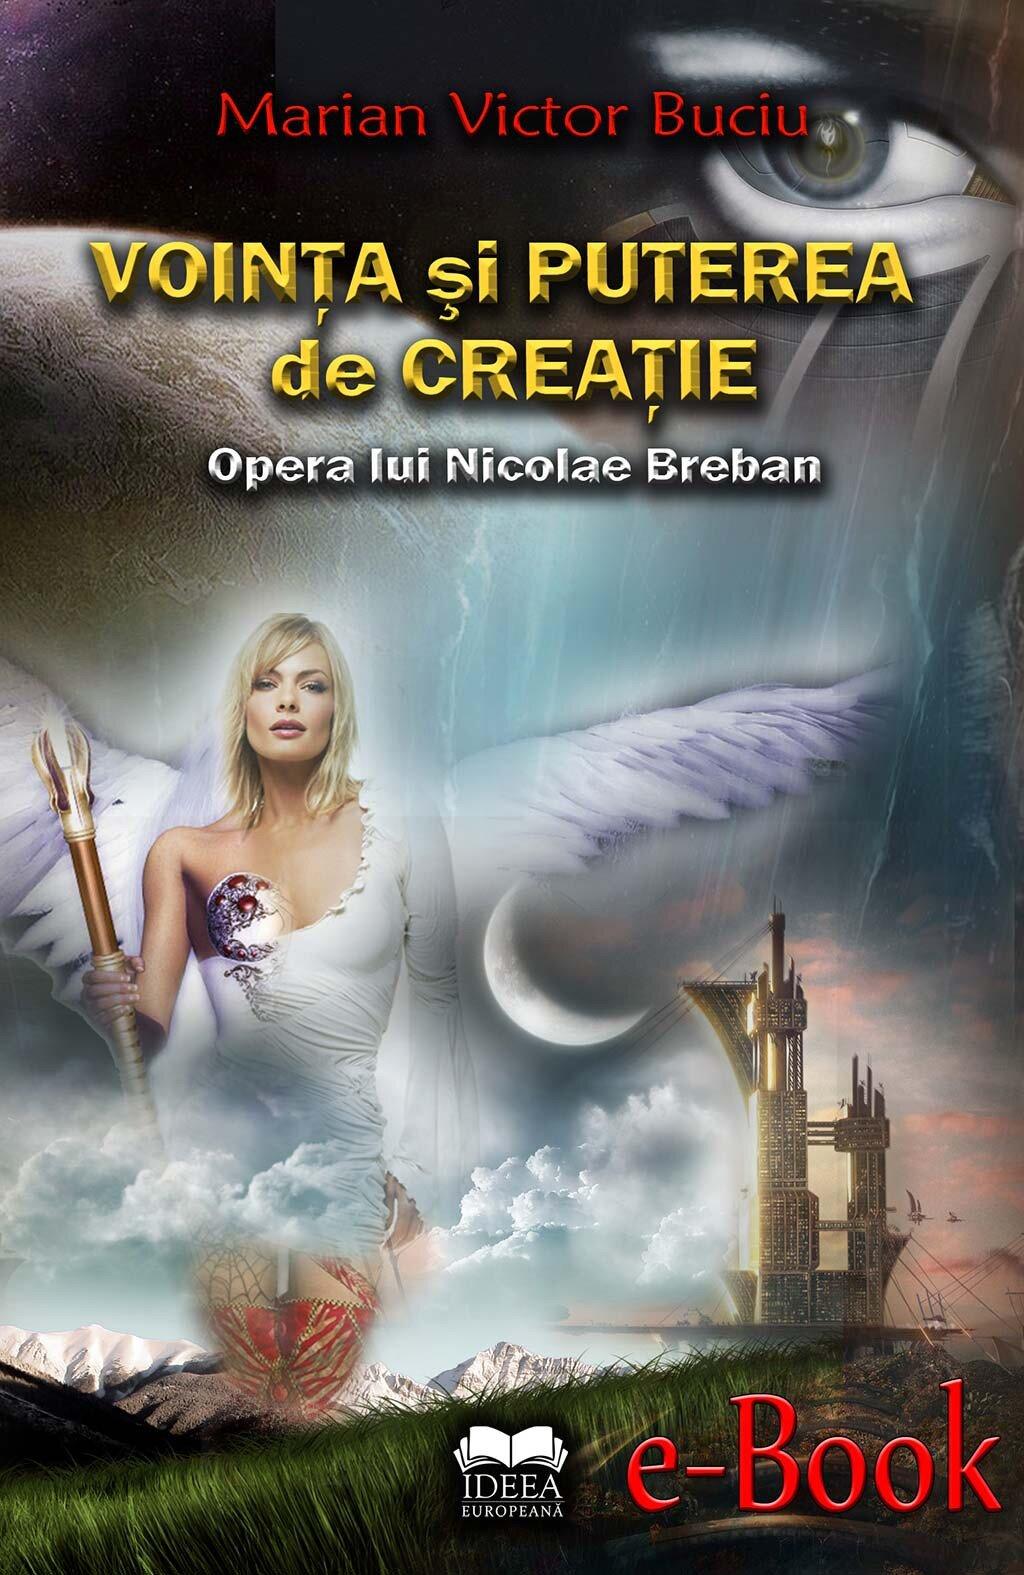 Vointa si puterea de creatie. Opera lui Nicolae Breban (eBook)